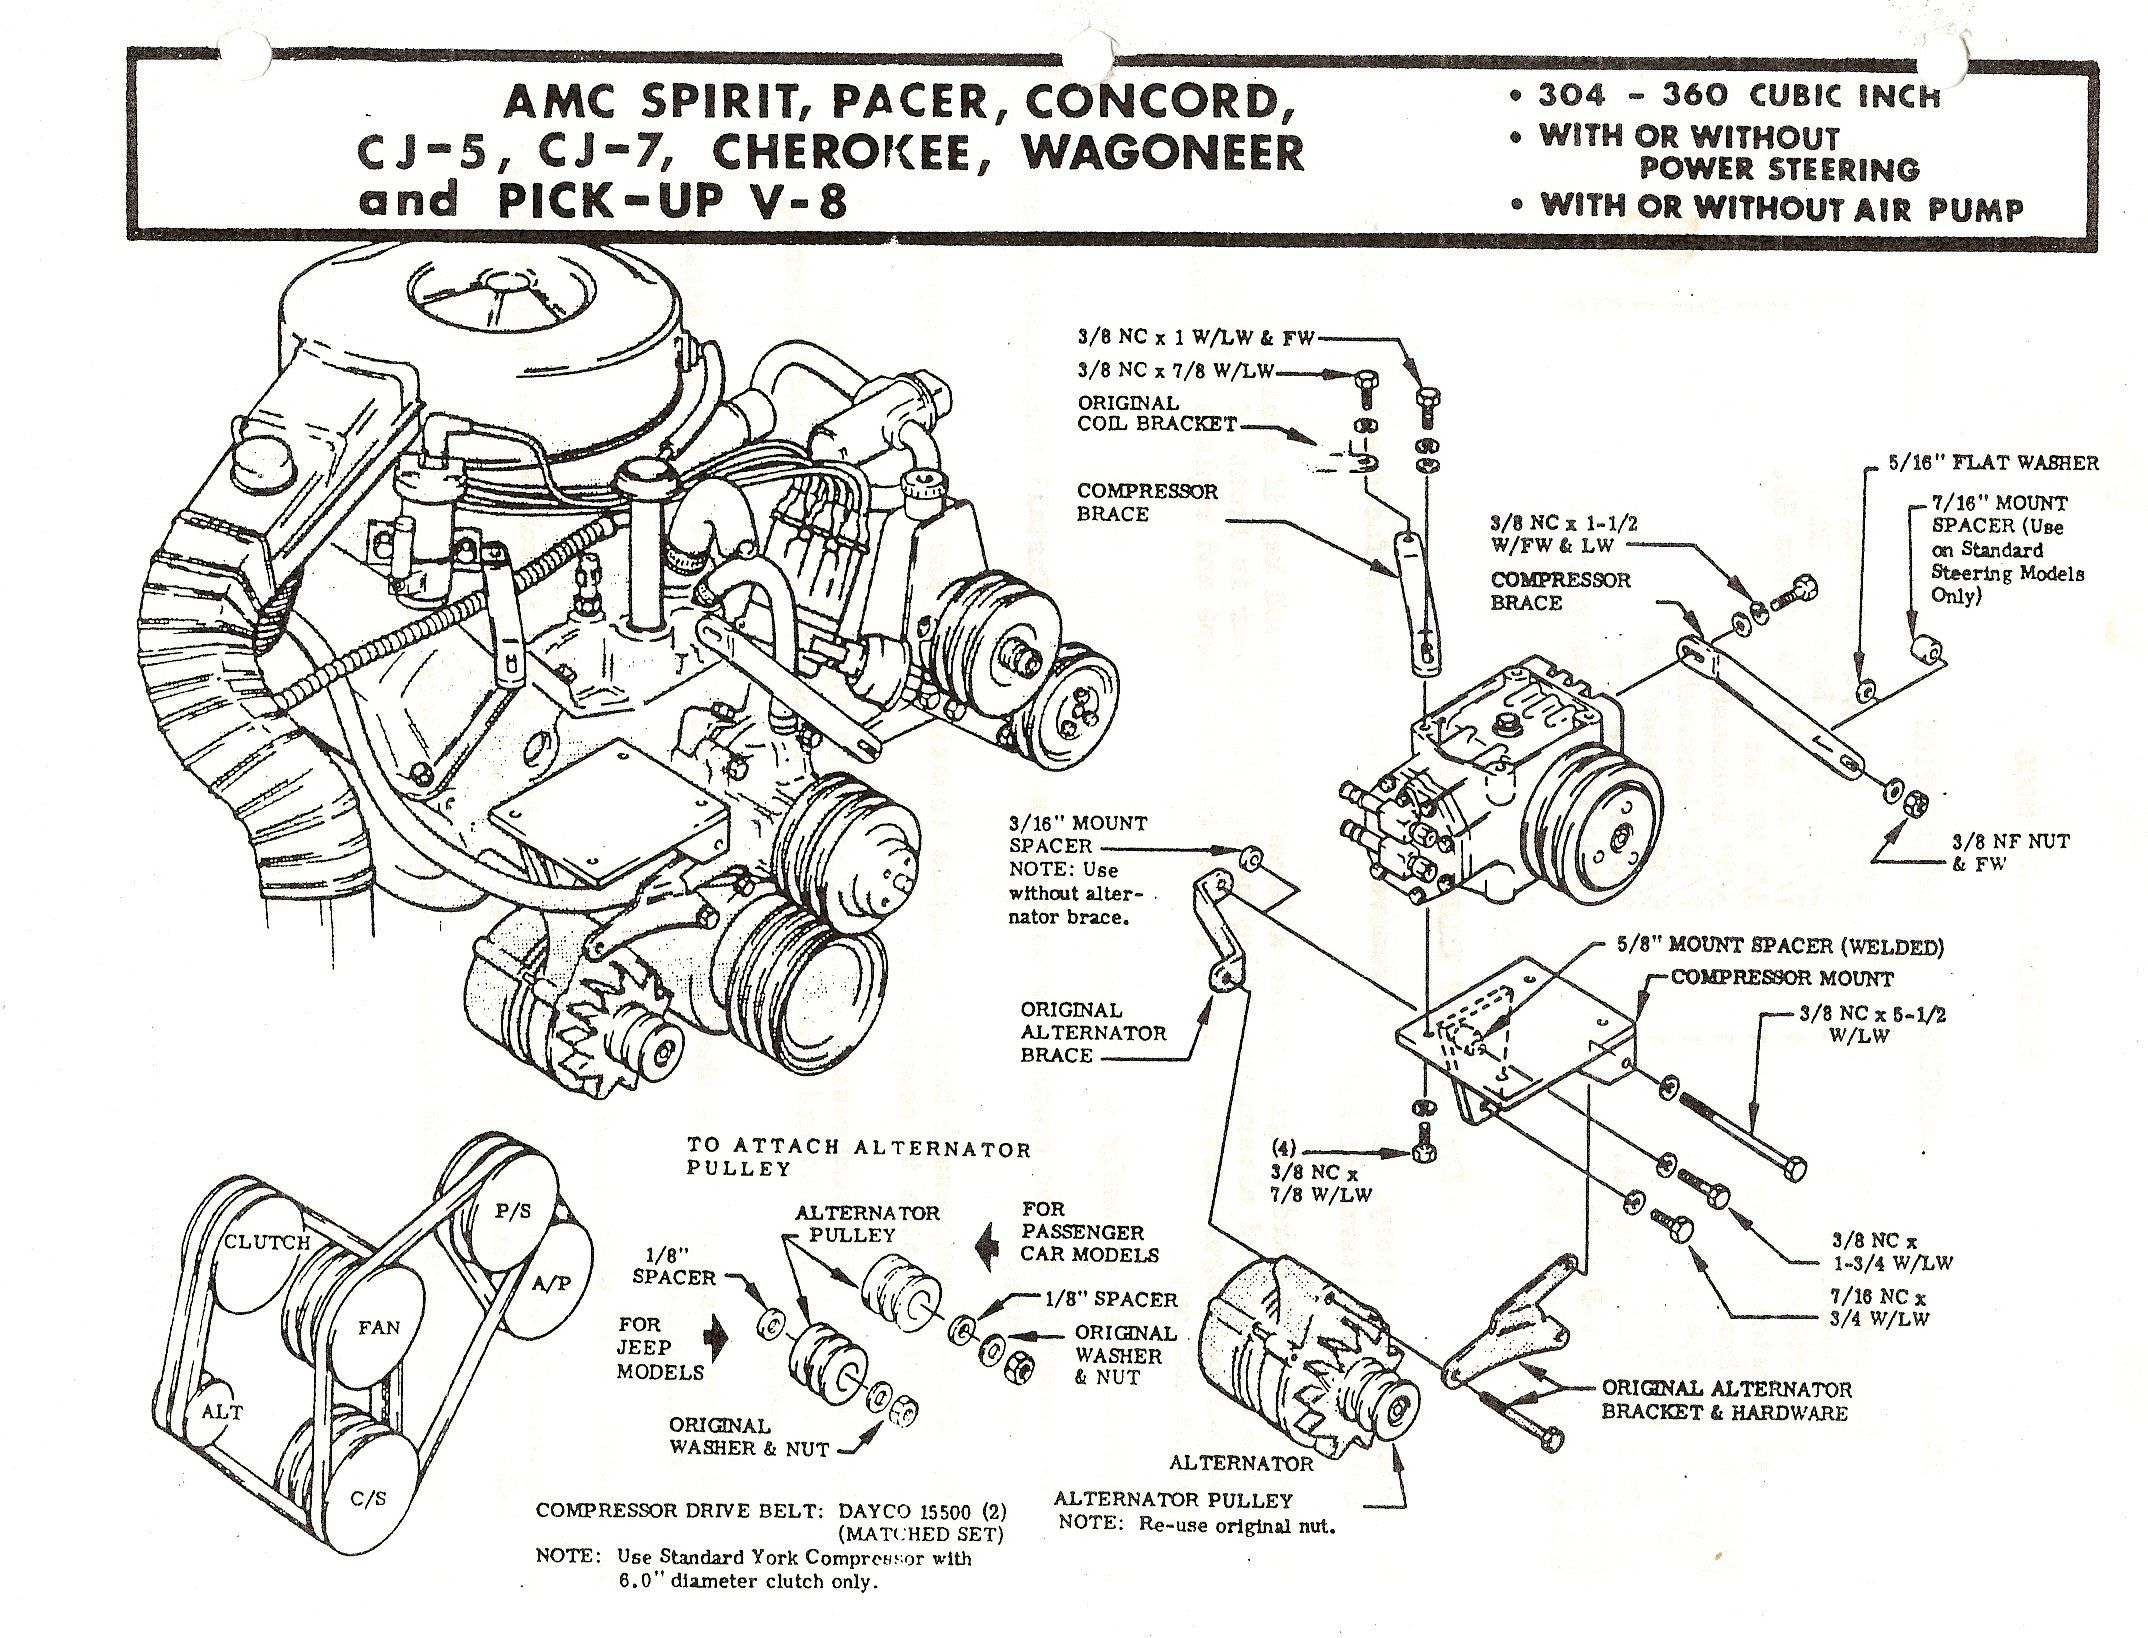 Ford 360 V8 Engine Diagram Anything Wiring Diagrams Database U2022 Rh Wiringme Today Cid Amc